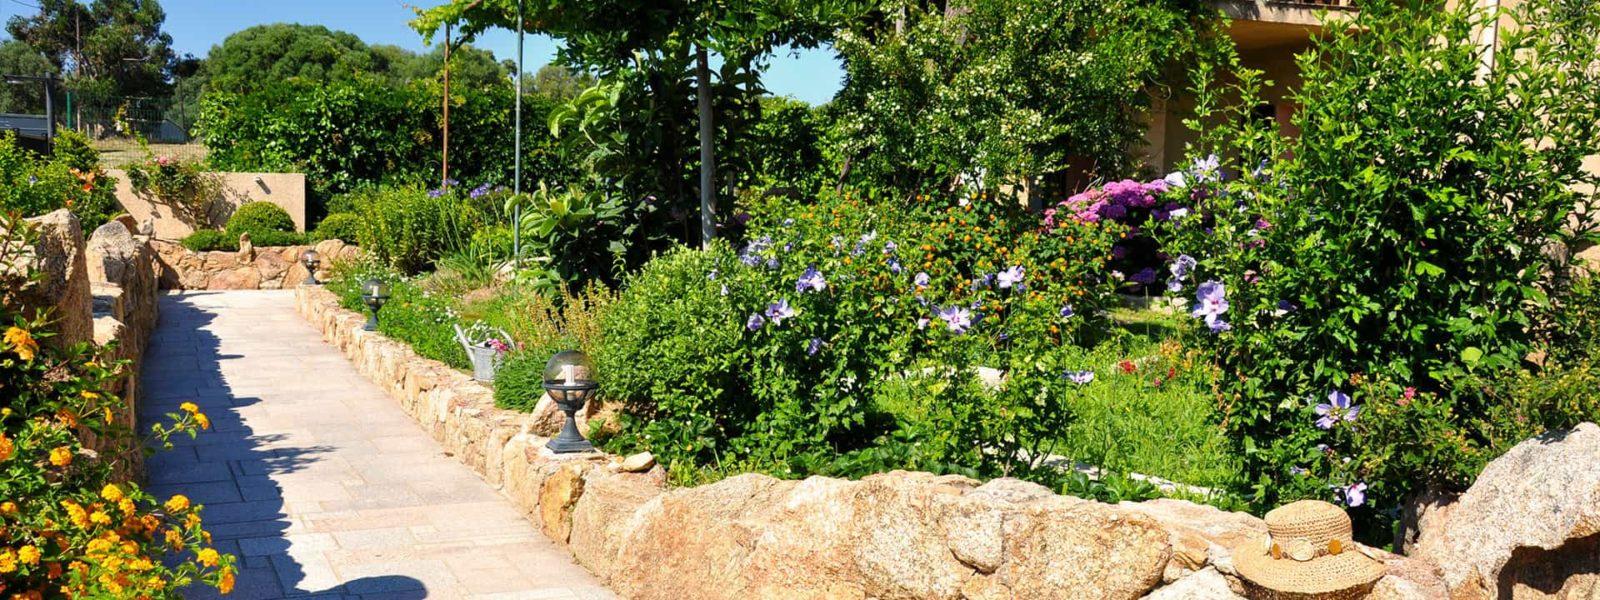 Location de Vacances en Corse du Sud - Casa Favalella, Serra di Ferro